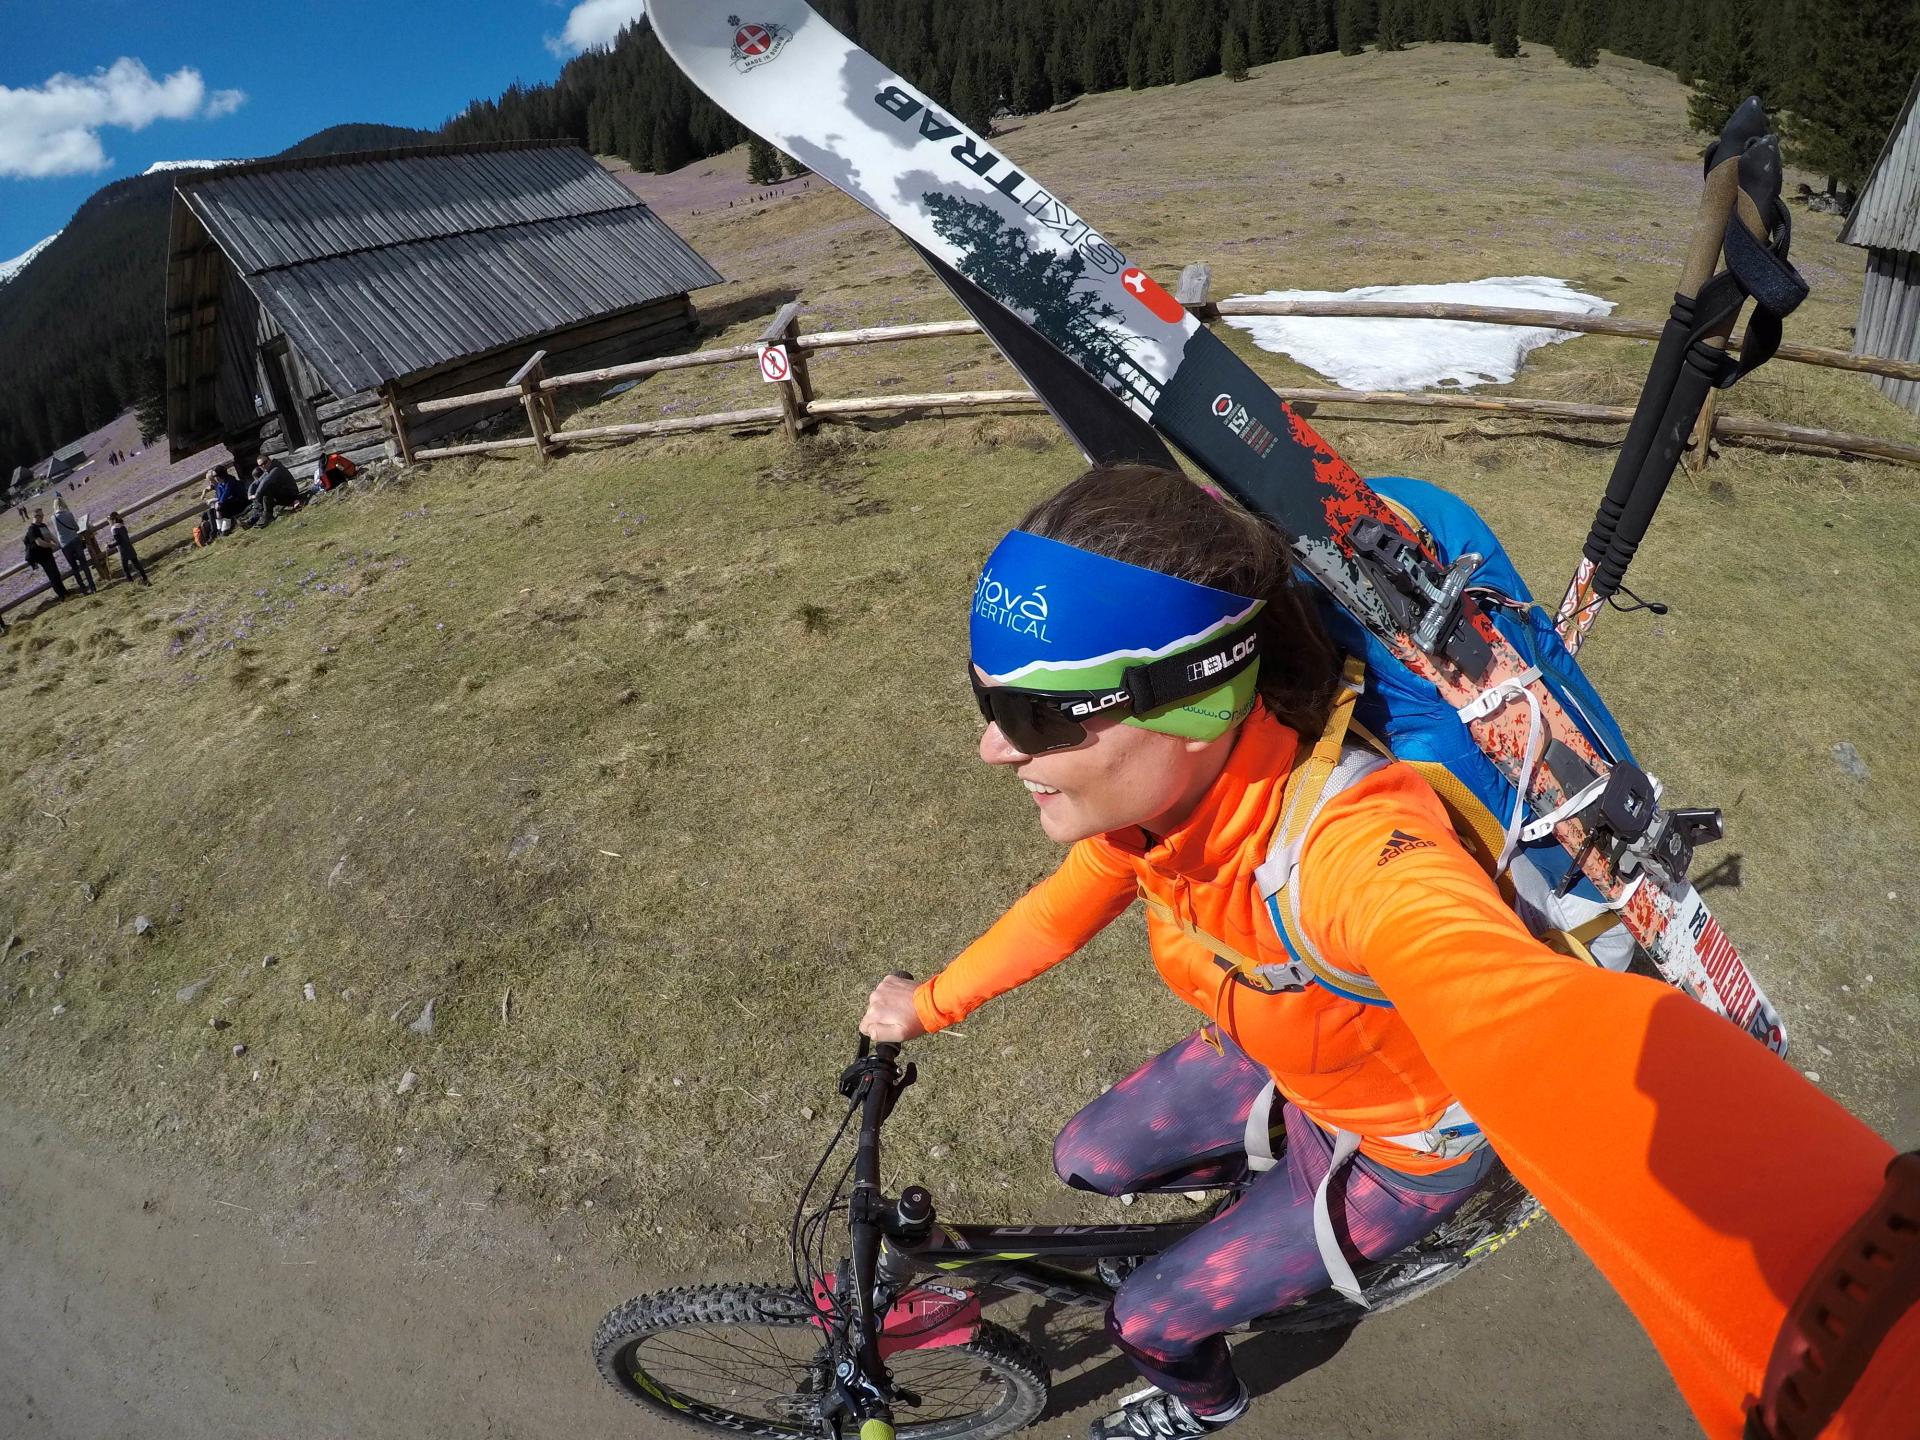 Dolina Chochołowska rower i skitury